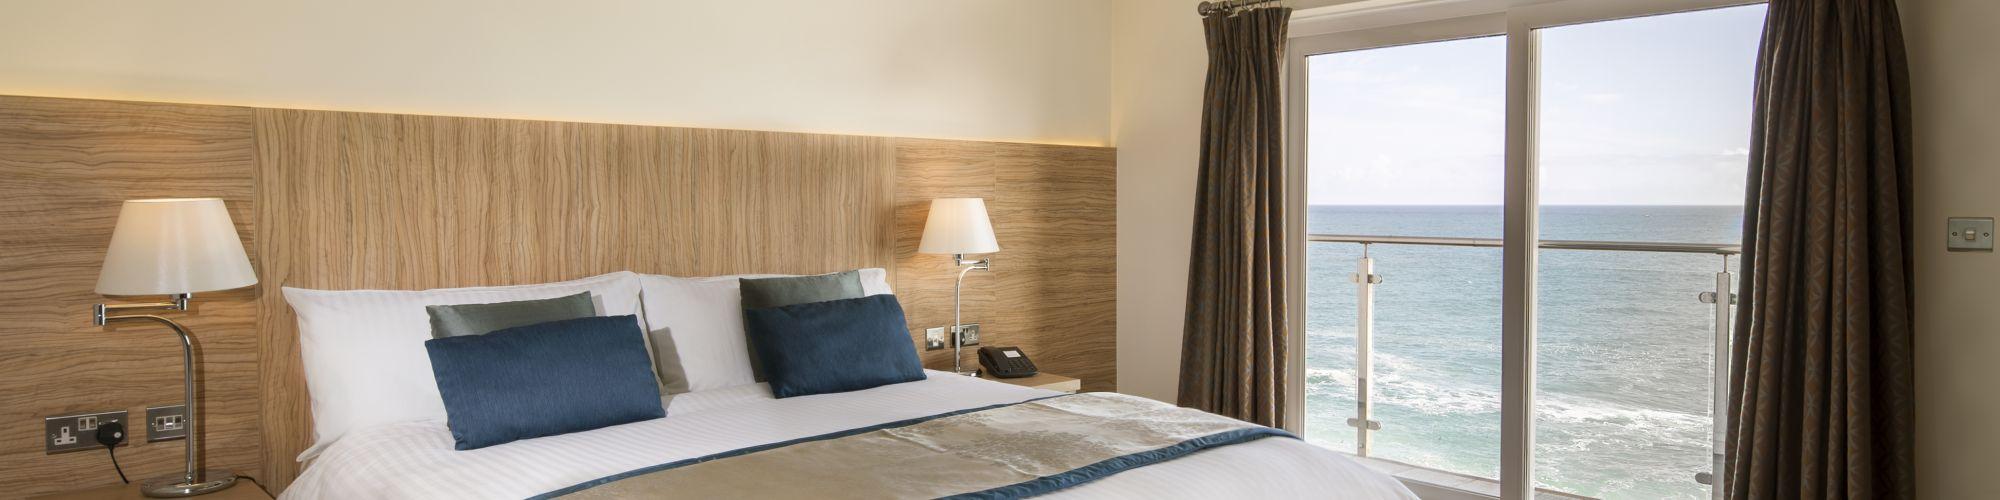 Fistral Beach Hotel Newquay Cornwall